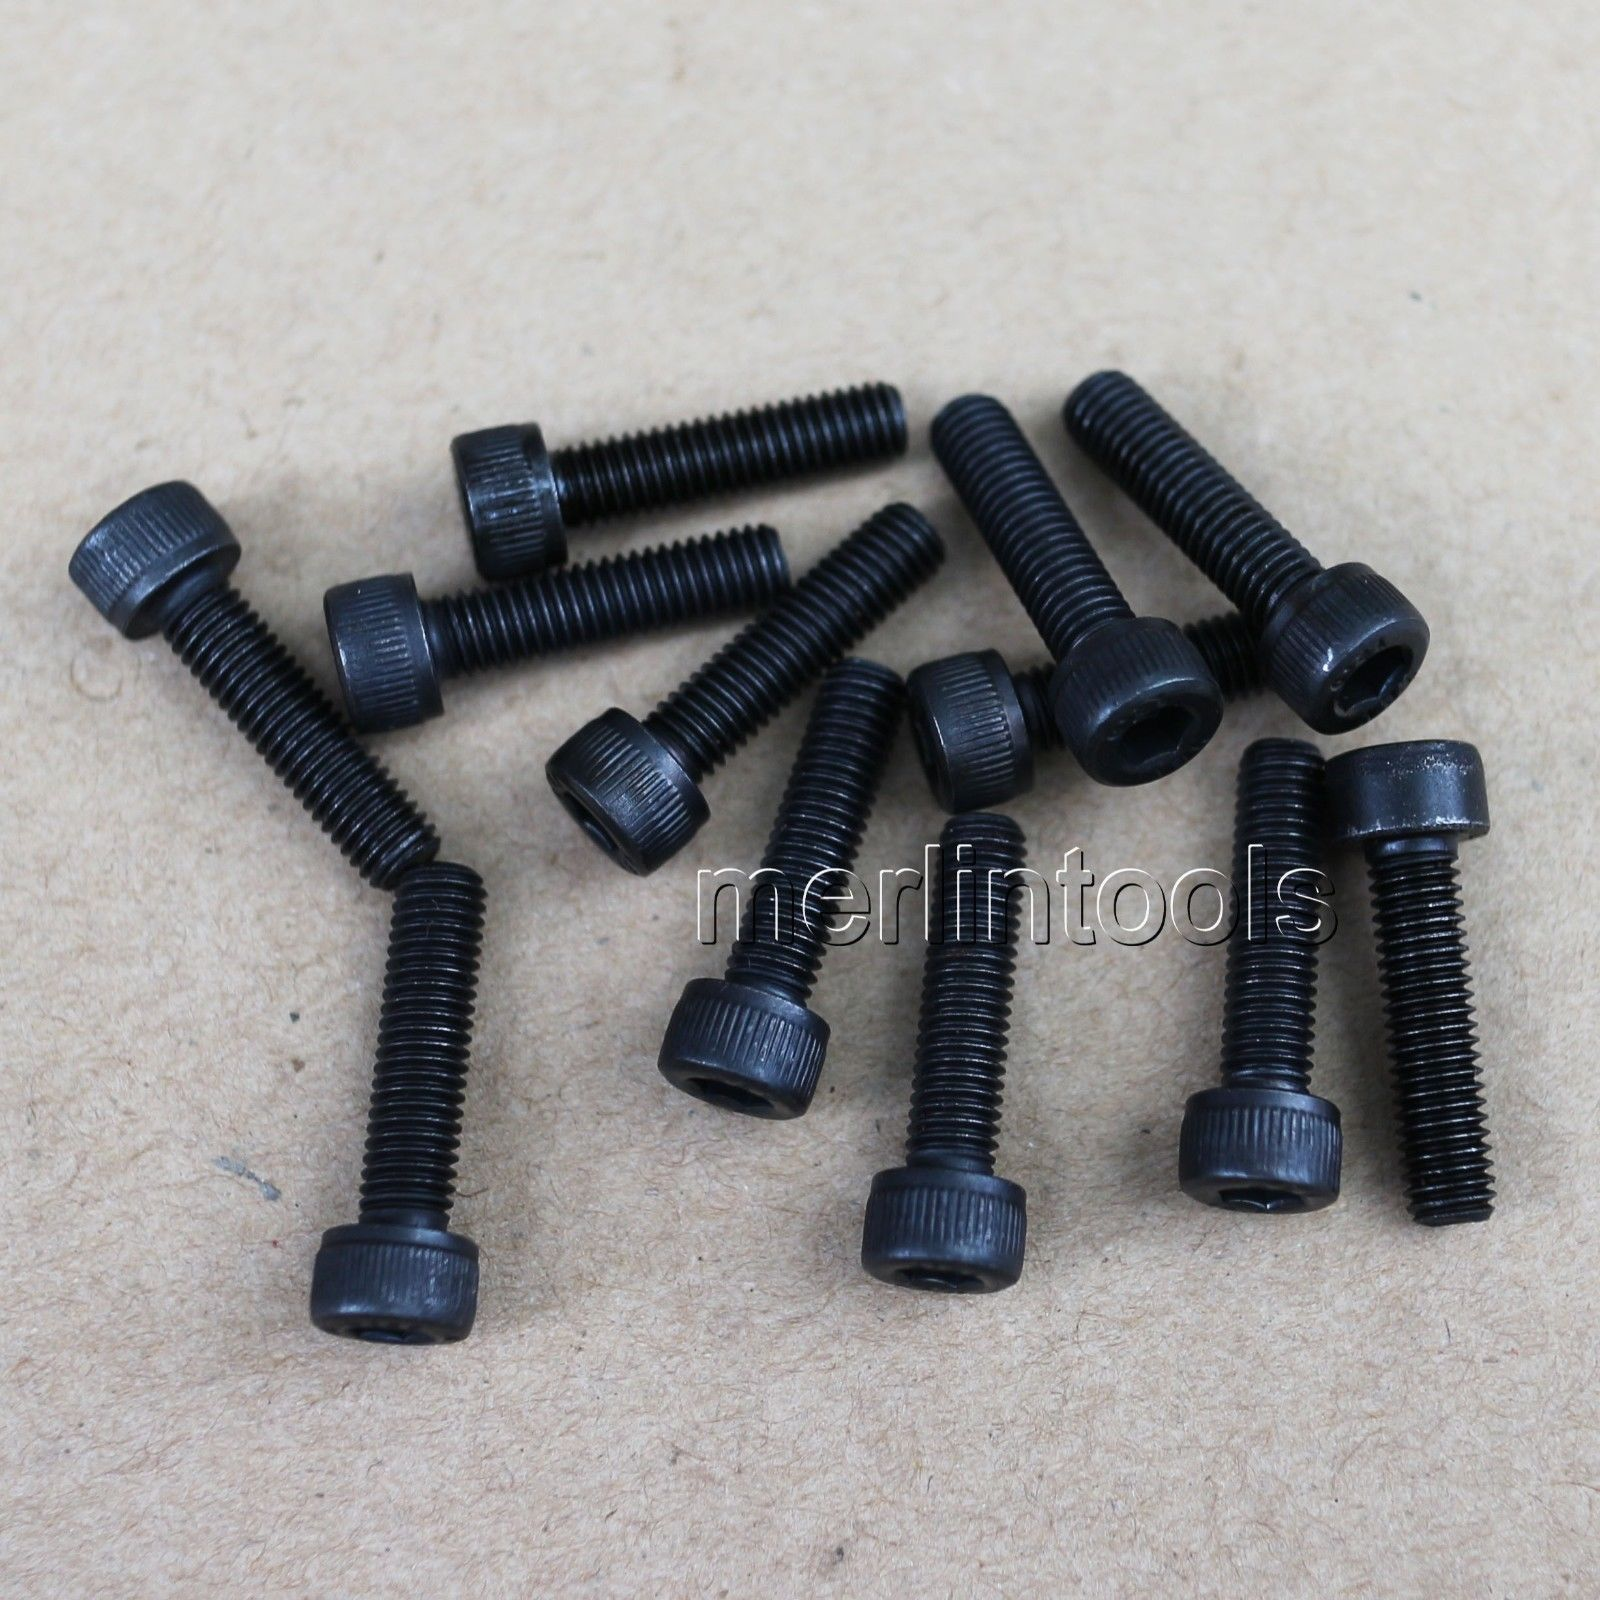 4-40 to 1/4-20 Allen Hex Socket Head Cap Screws Assortment Kit 200pcs 304ss m3 m4 m5 m6 cone point allen head hex socket screws assortment kit